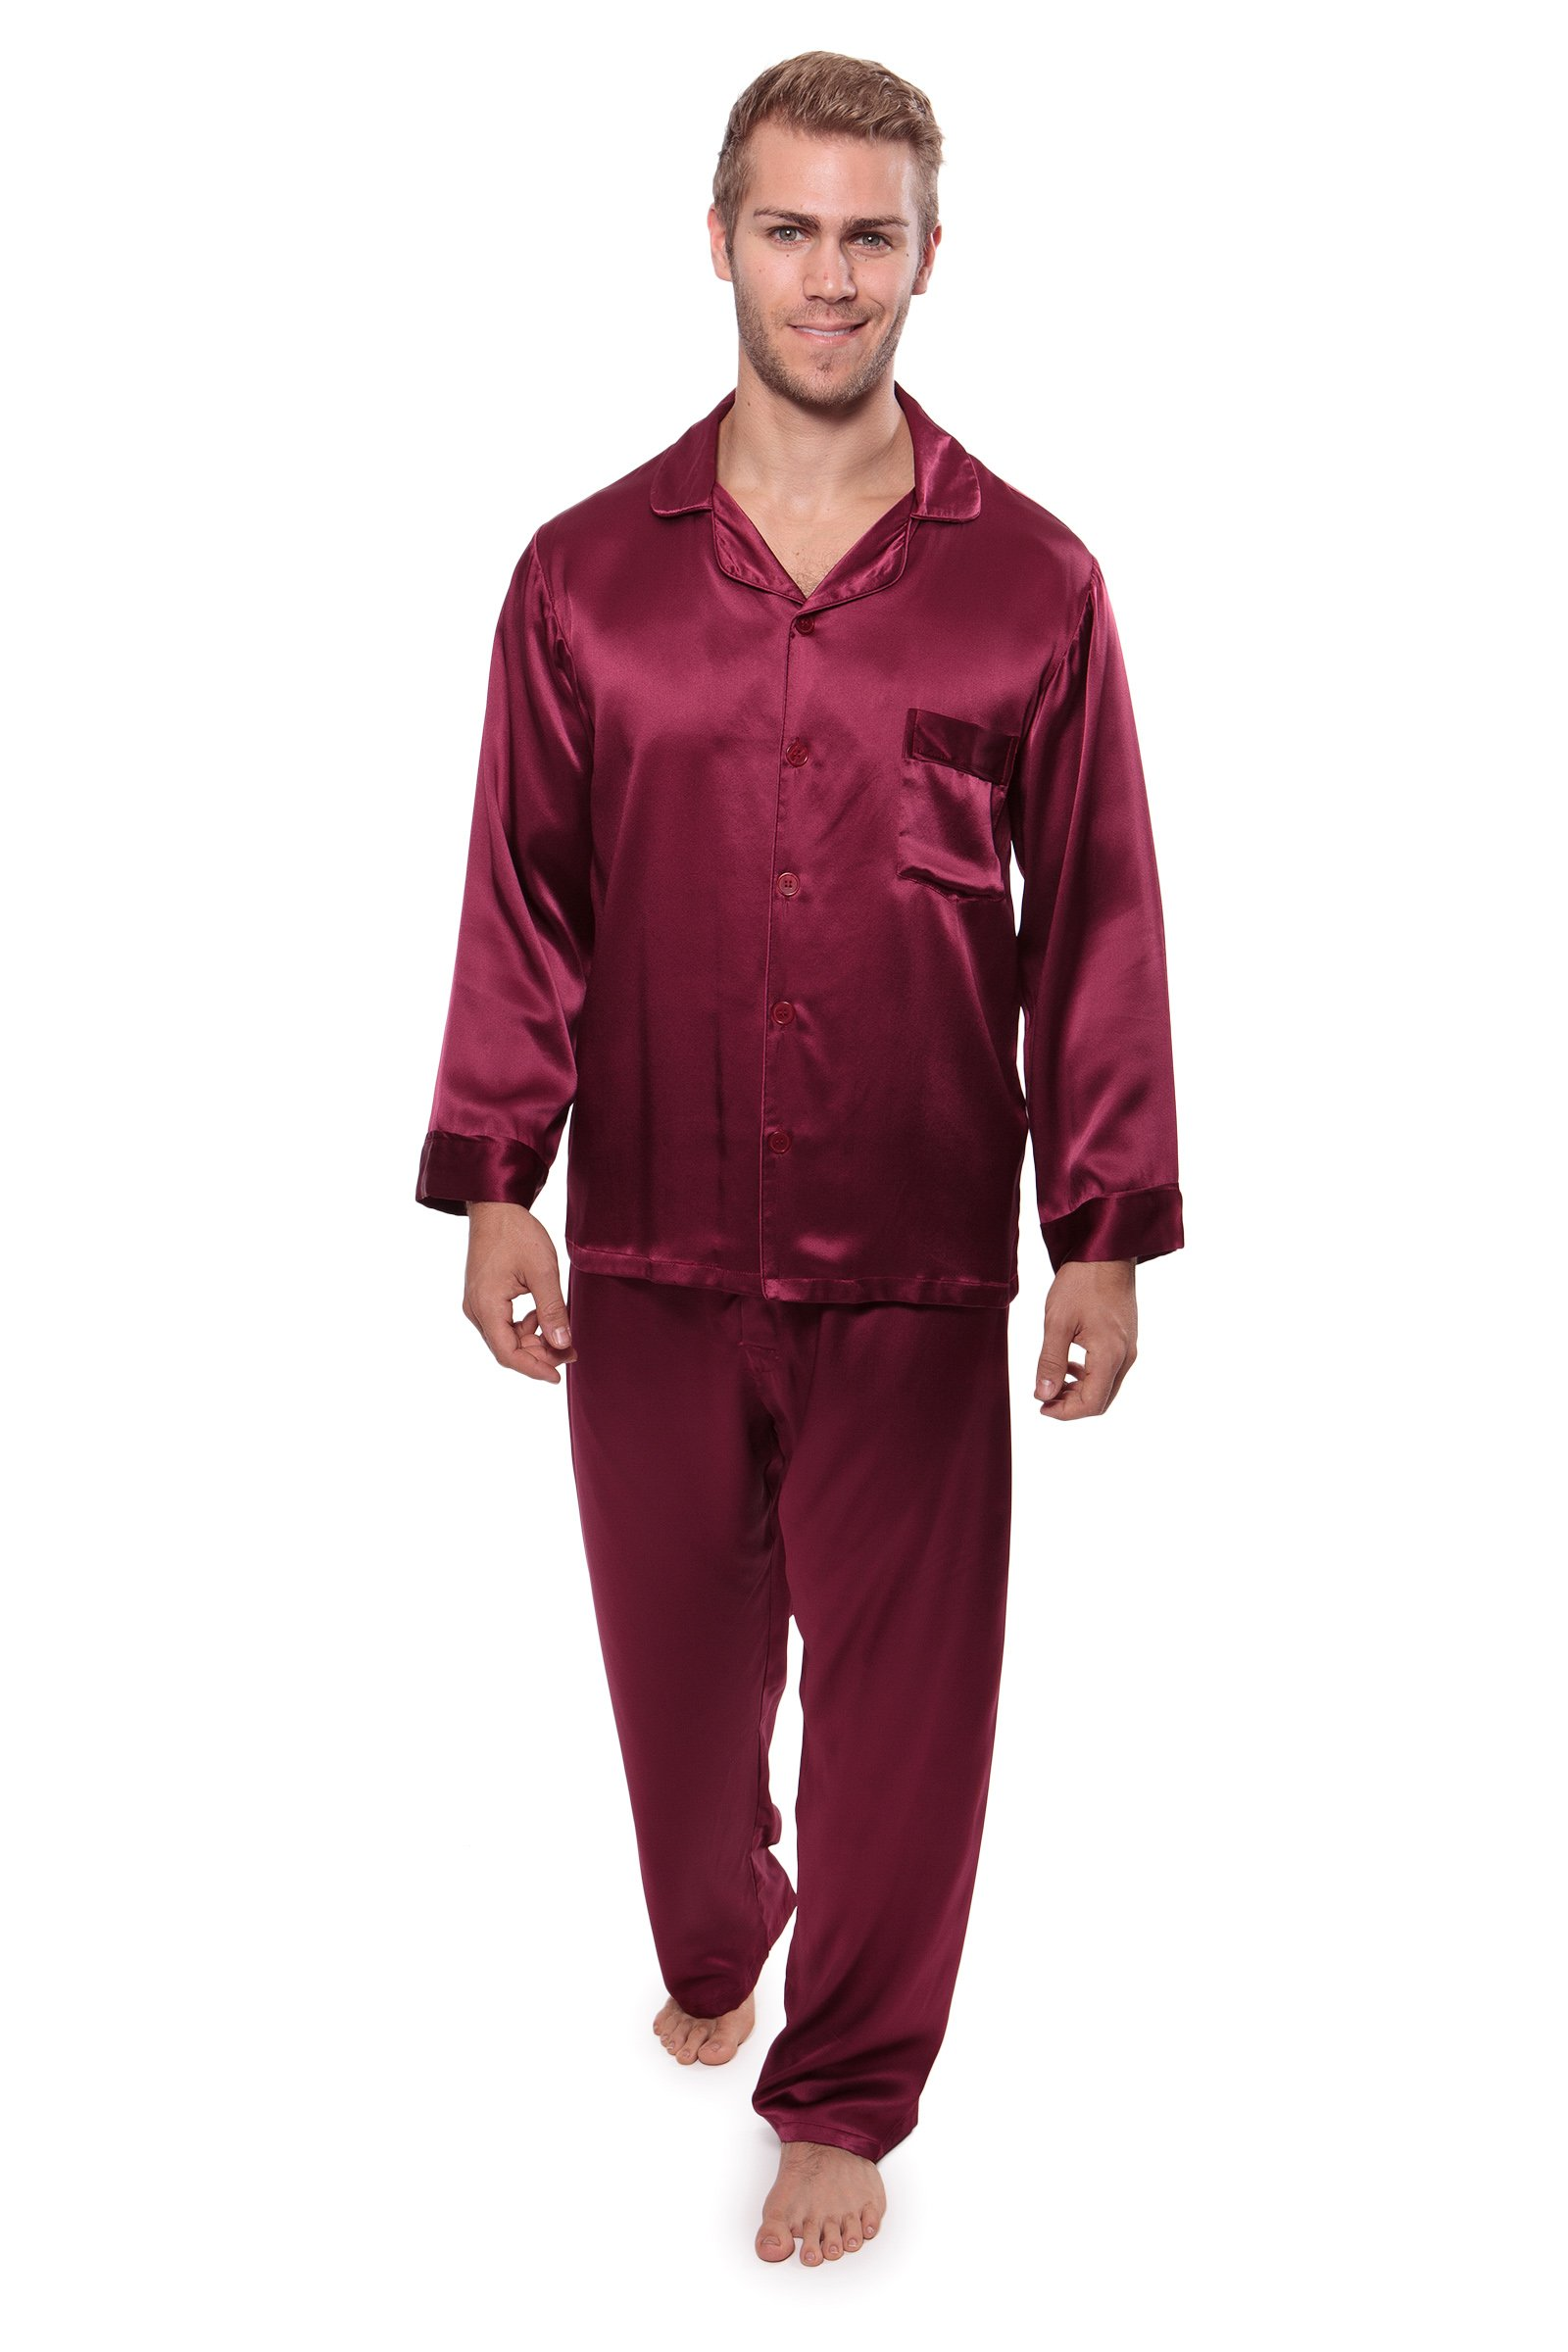 Men's Silk Pajamas - Luxury Silk Nightwear Pajama Set for Men - Sleepwear PJs (Burgundy, Large) Best Xmas Gift for Him